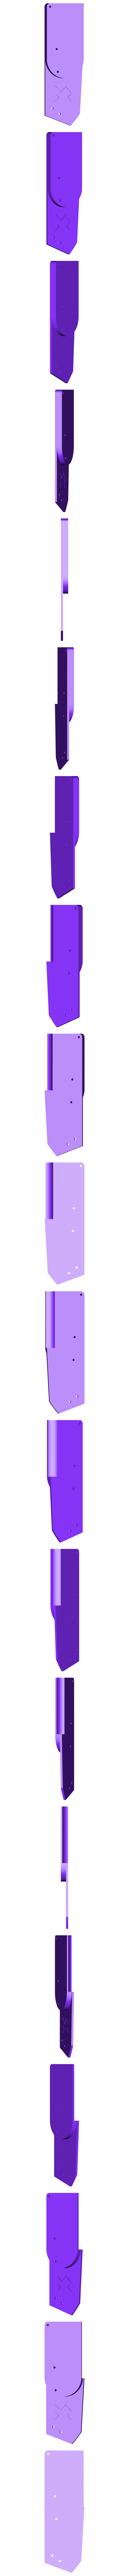 15_FCC_Plaque2.stl Download free STL file Ymir - Airsoft Shotgun/grenade launcher • 3D print design, Snorri